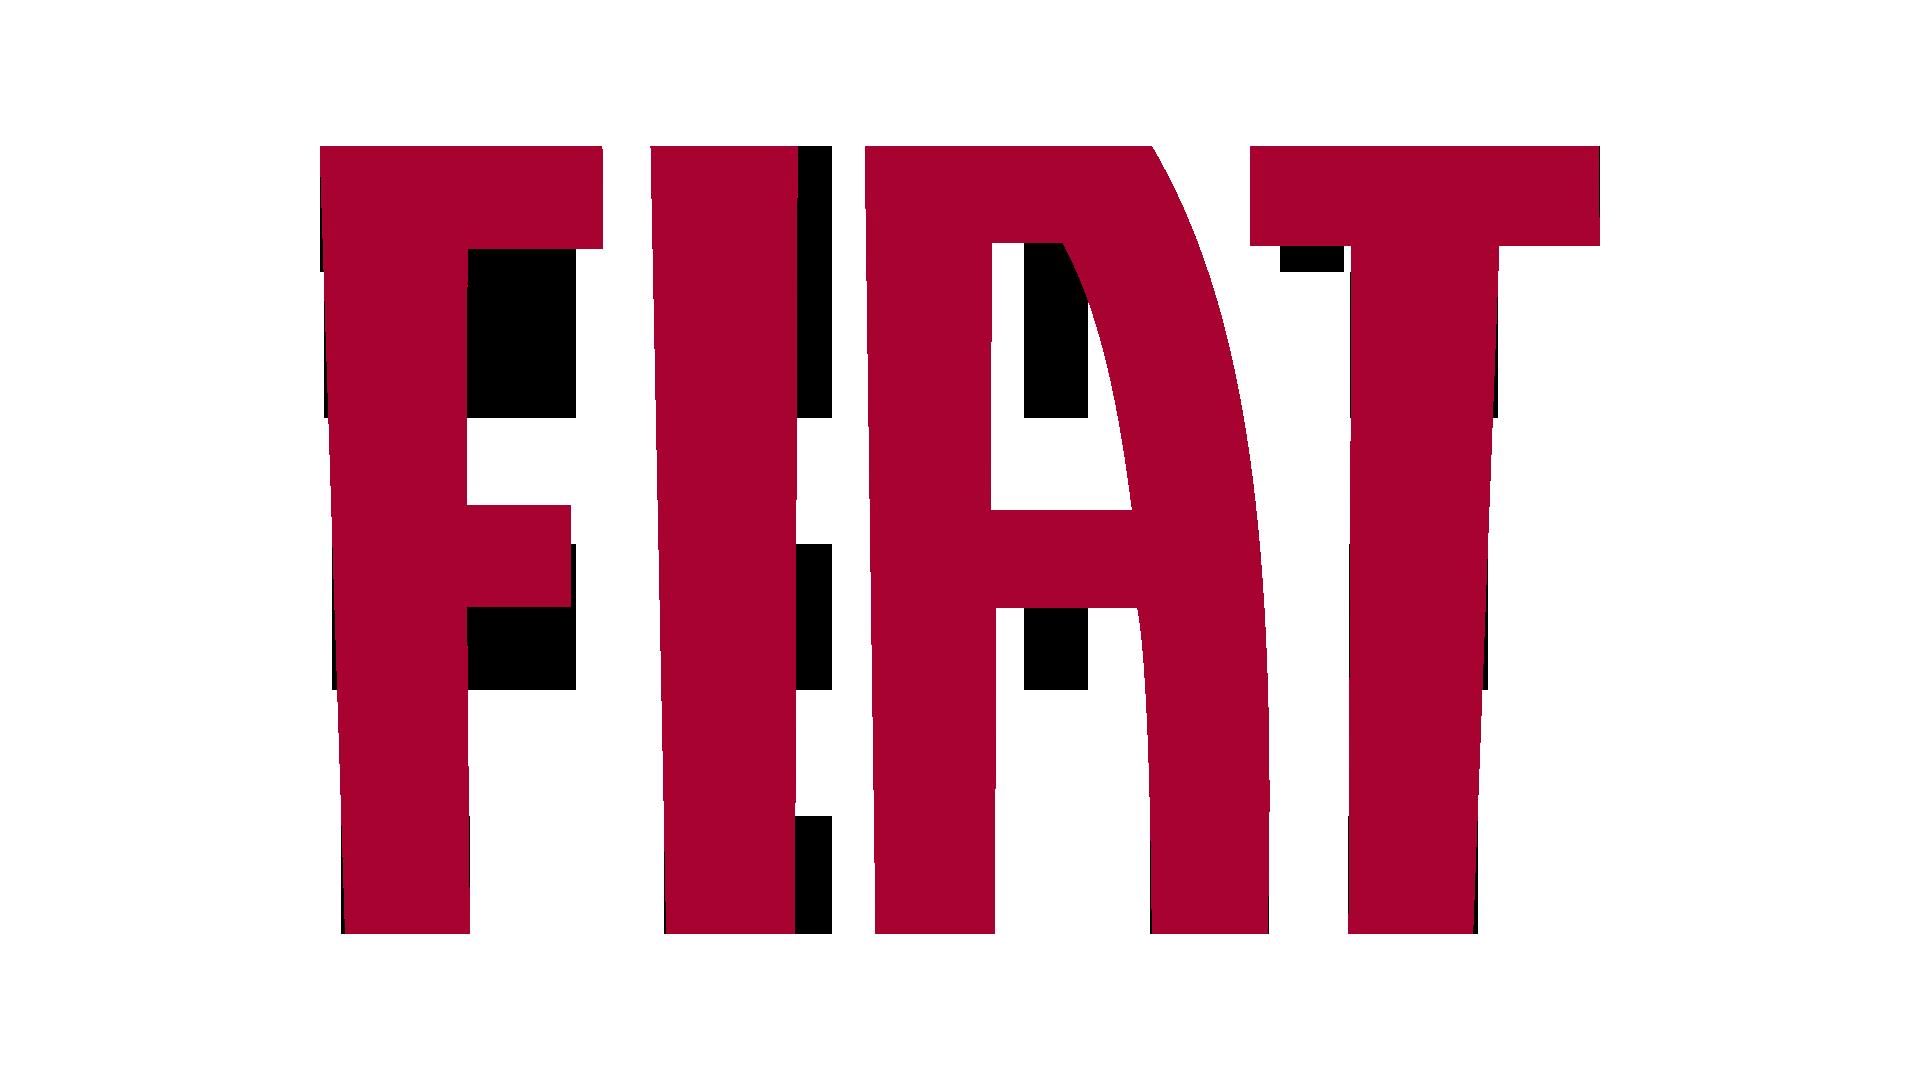 Fiat Text Logo 1920x1080 HD png - Fiat HD PNG